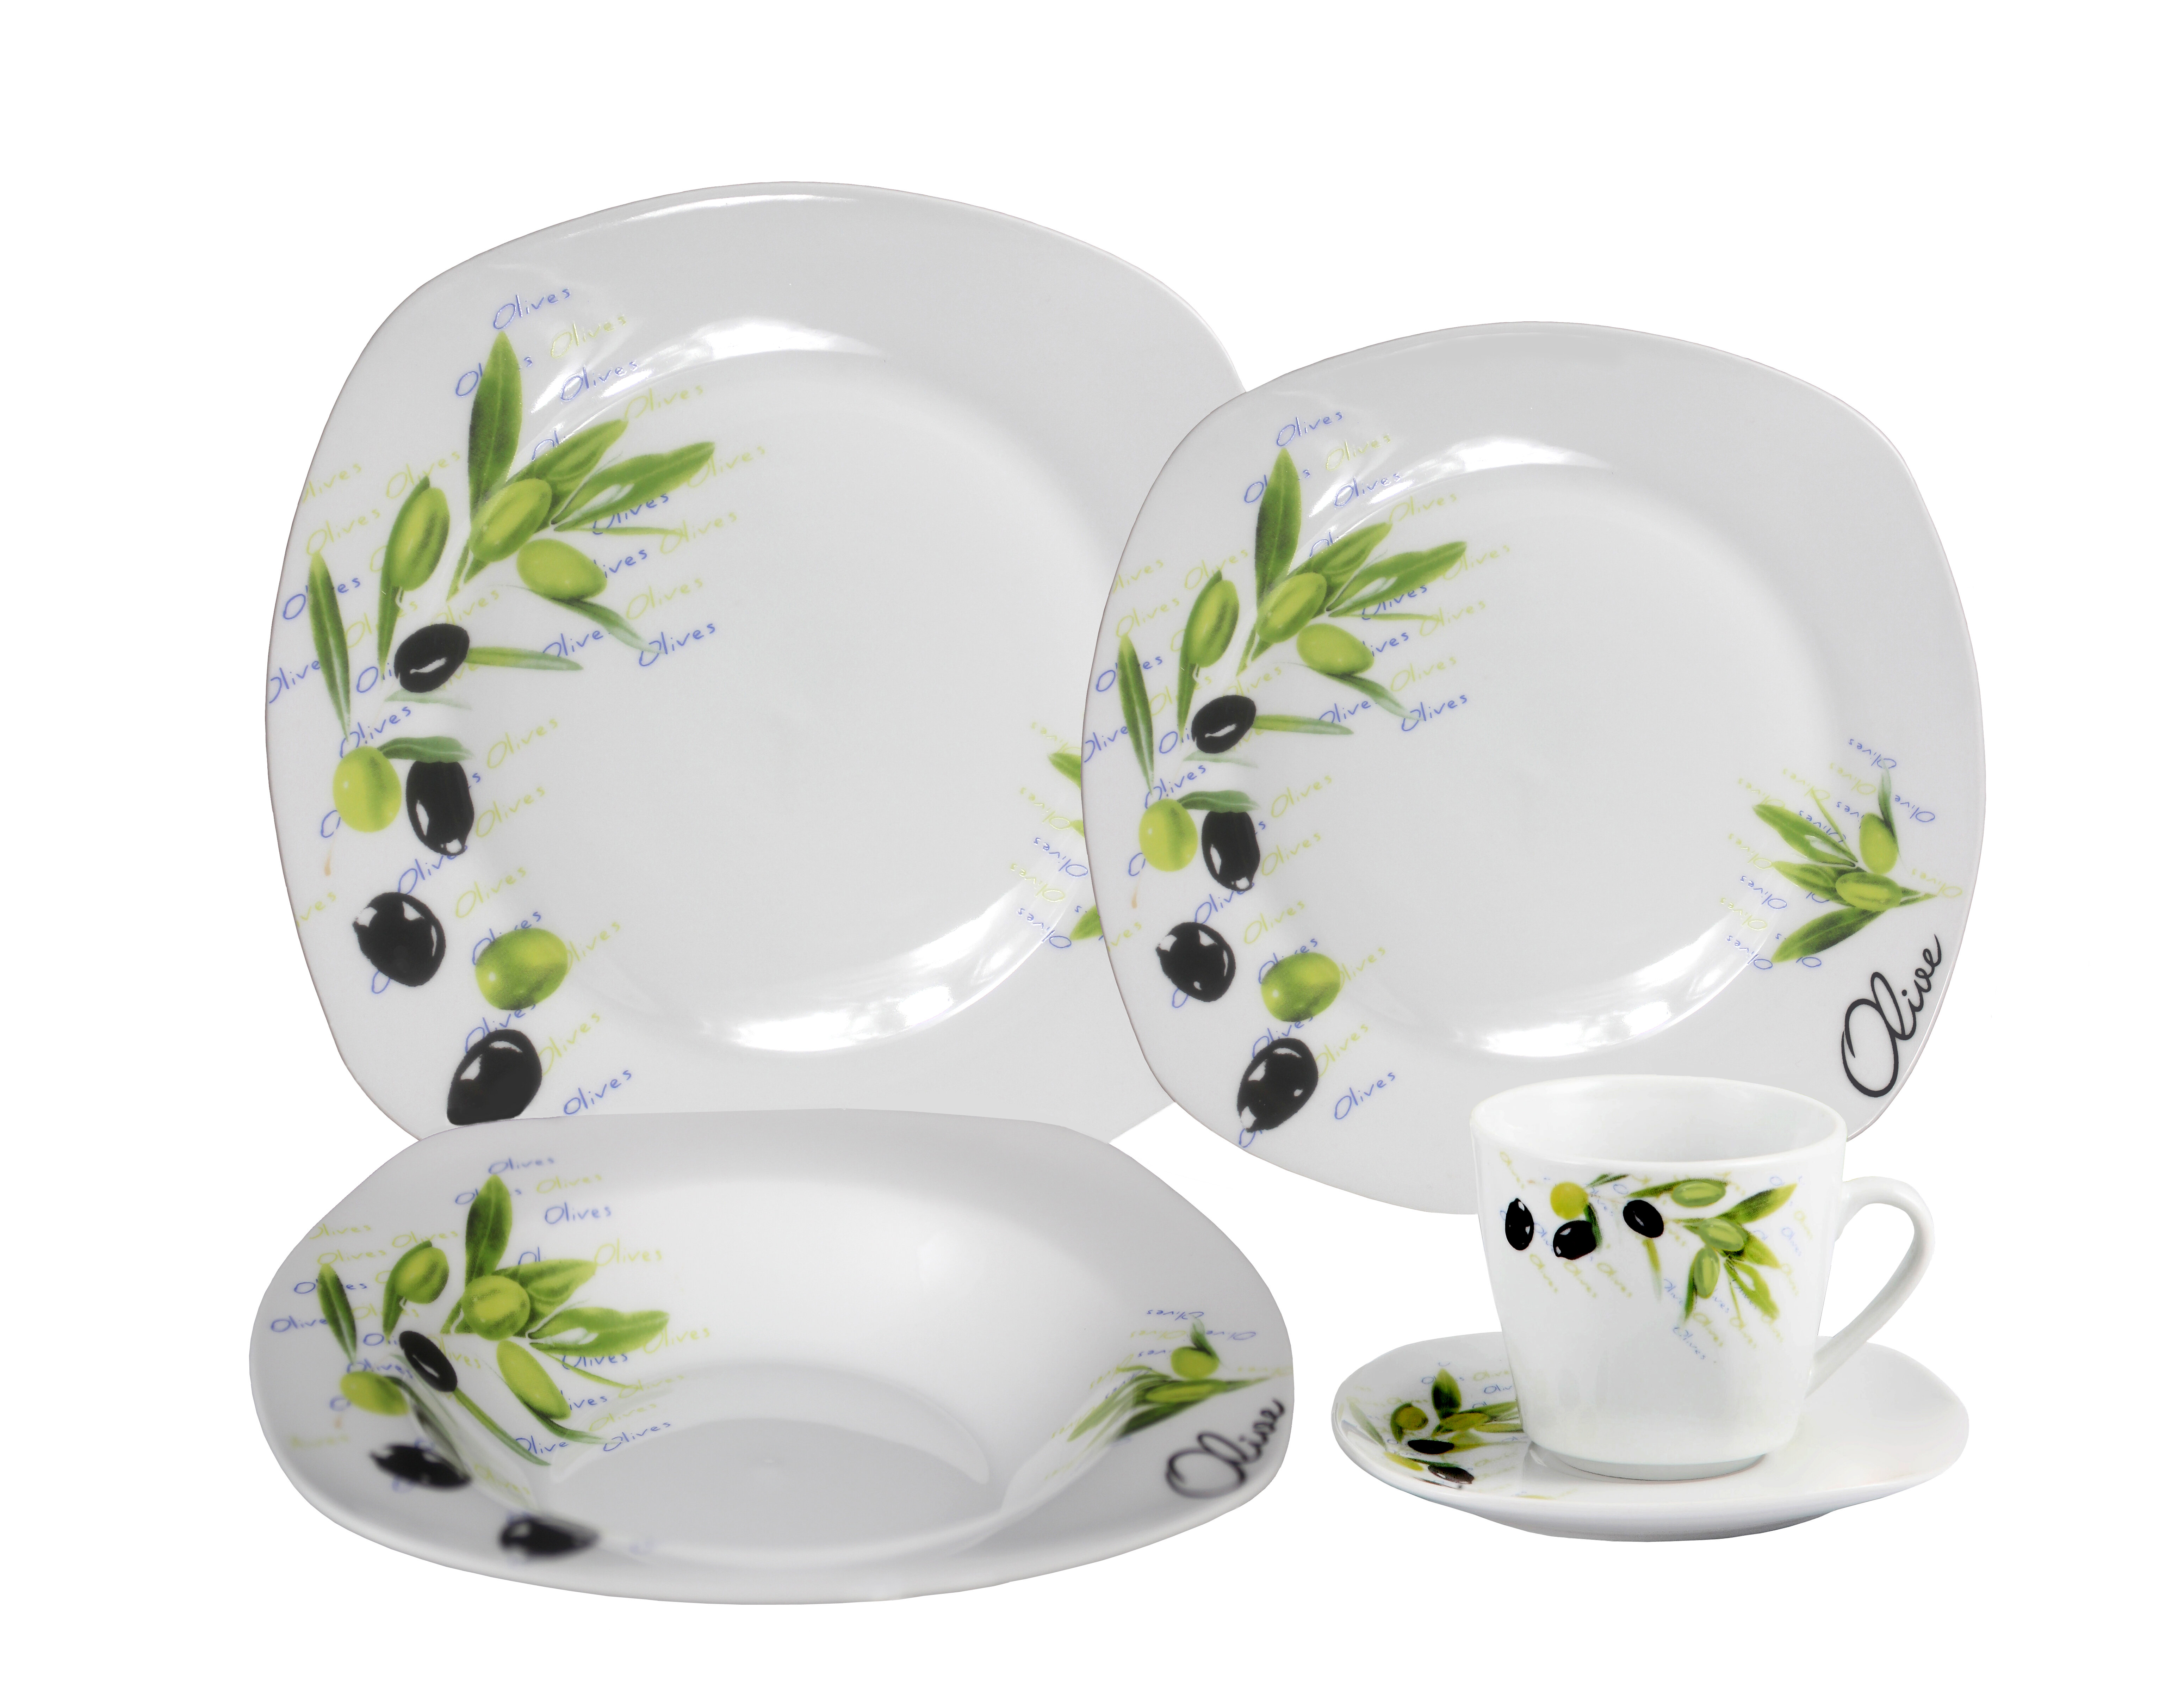 d602be8437c6 Lorren Home Trends Porcelain 20 Piece Square Dinnerware Set